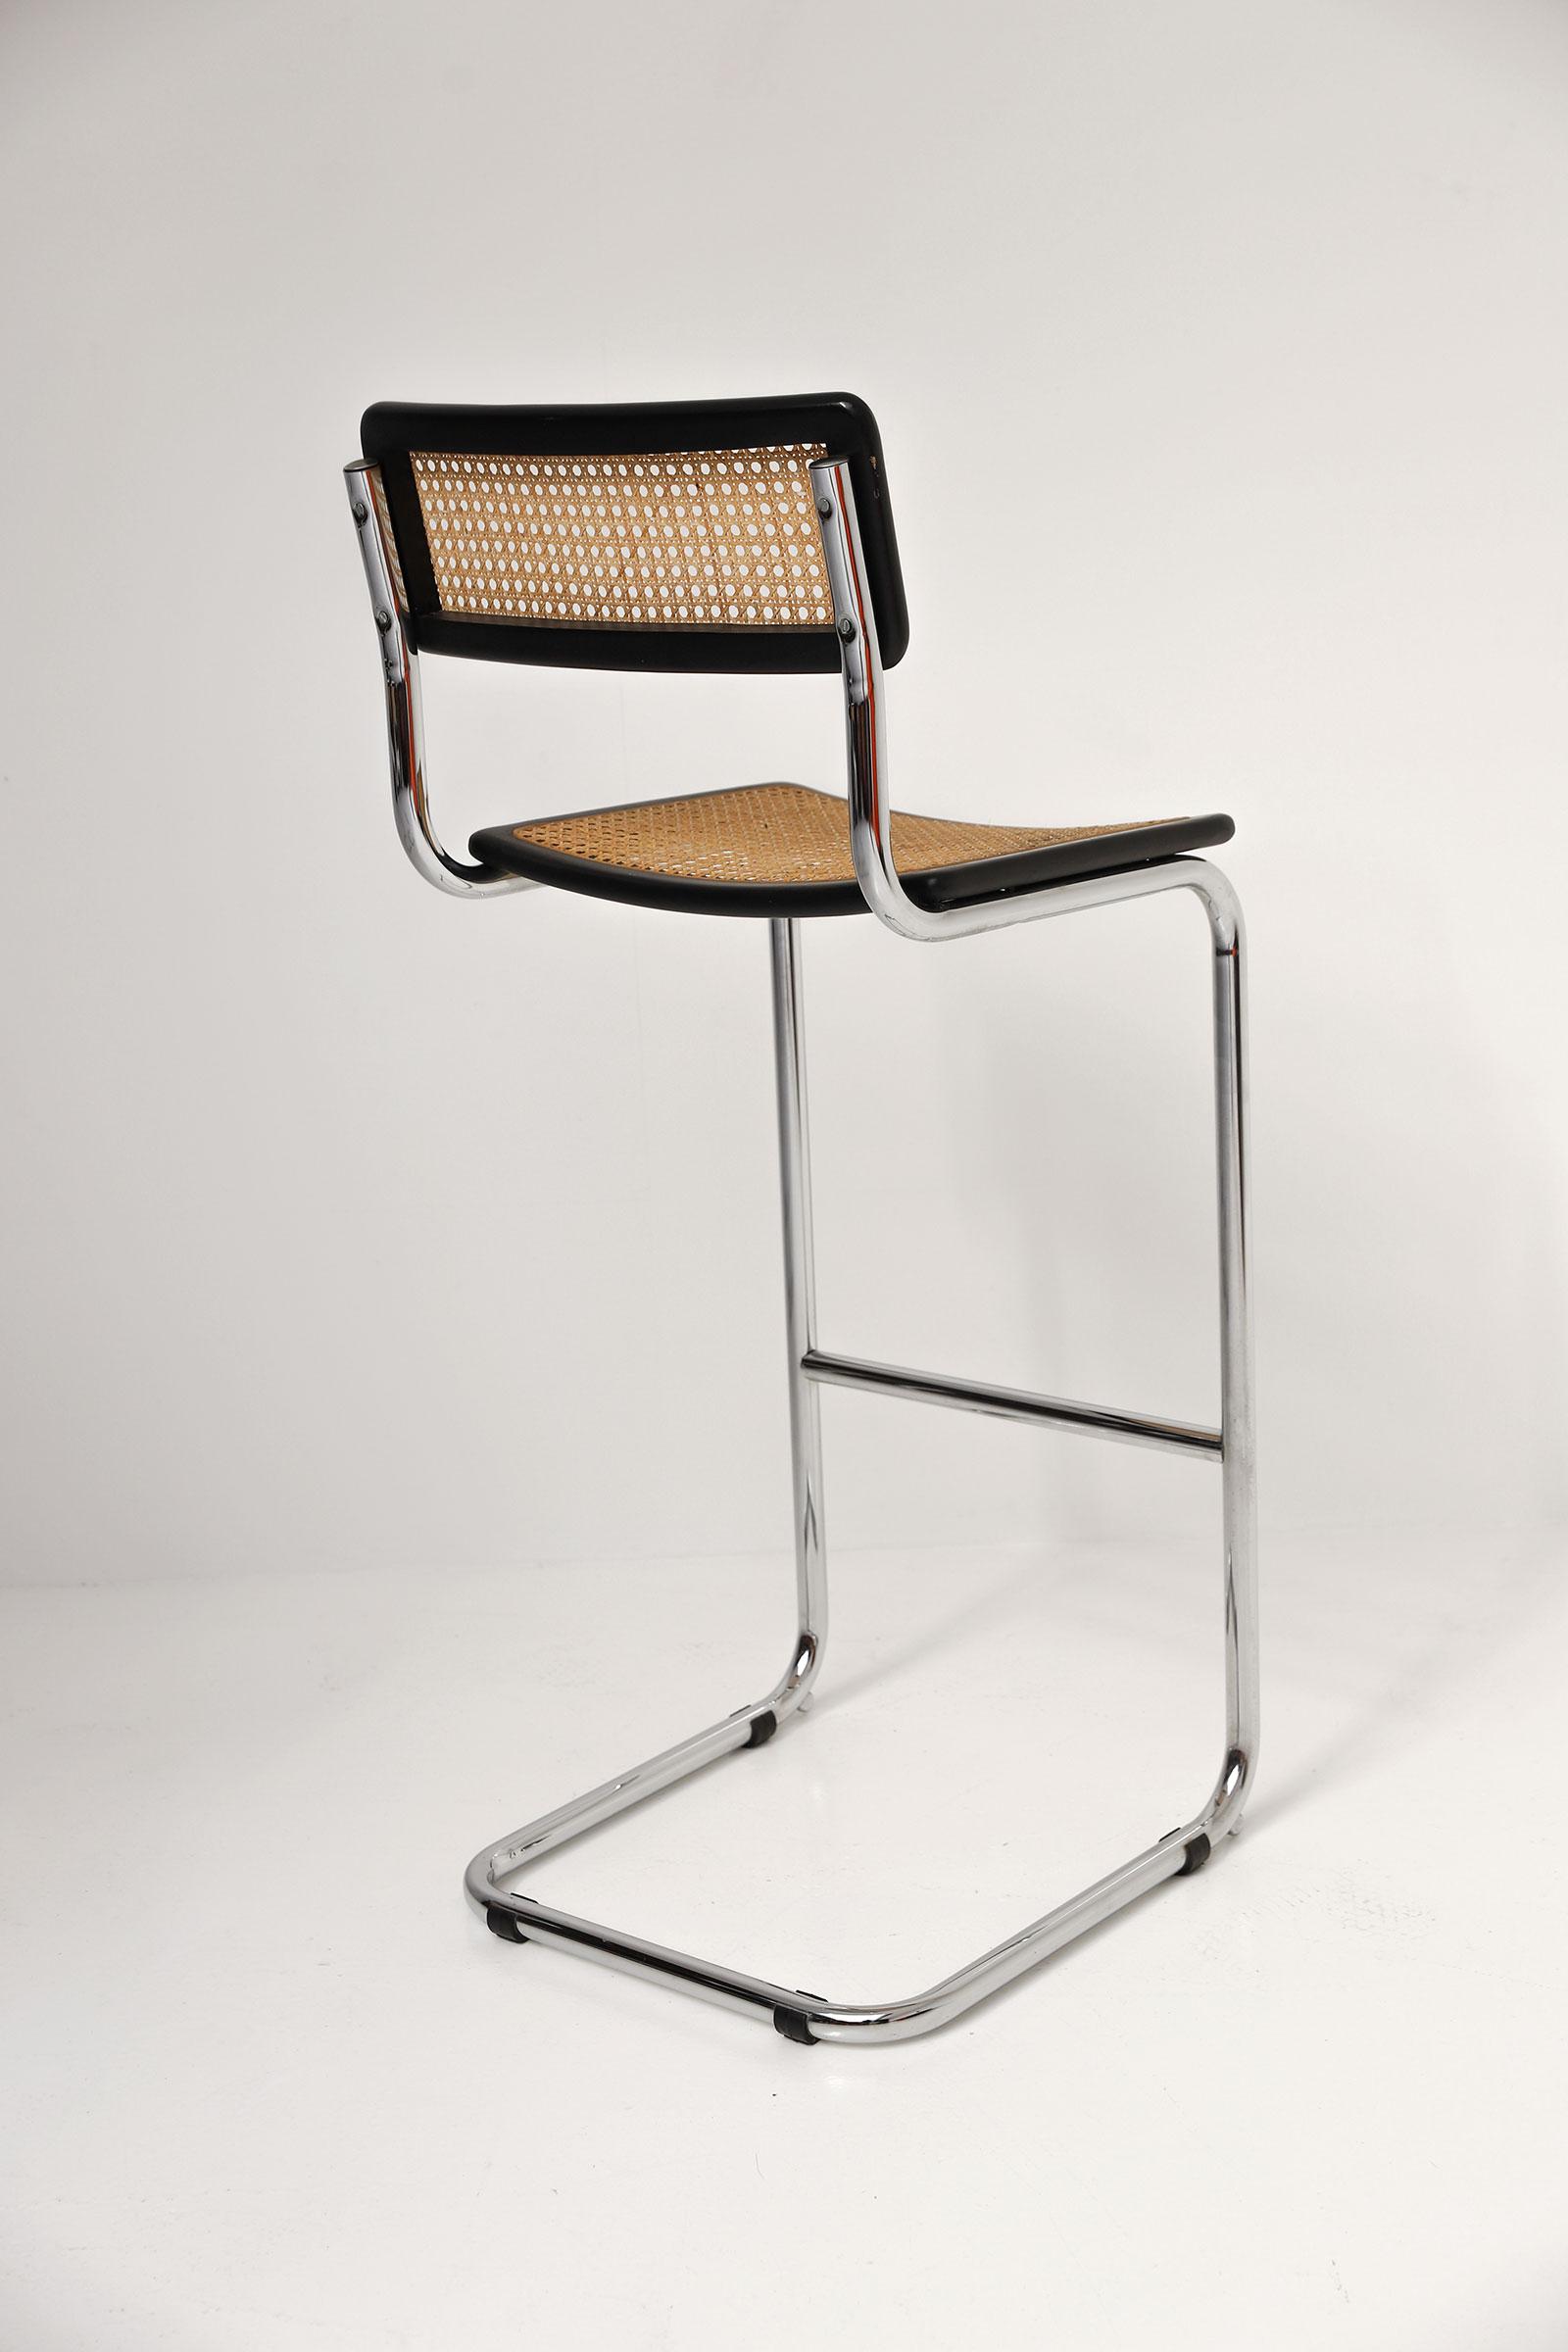 Cesca cantilever bar stools image 7